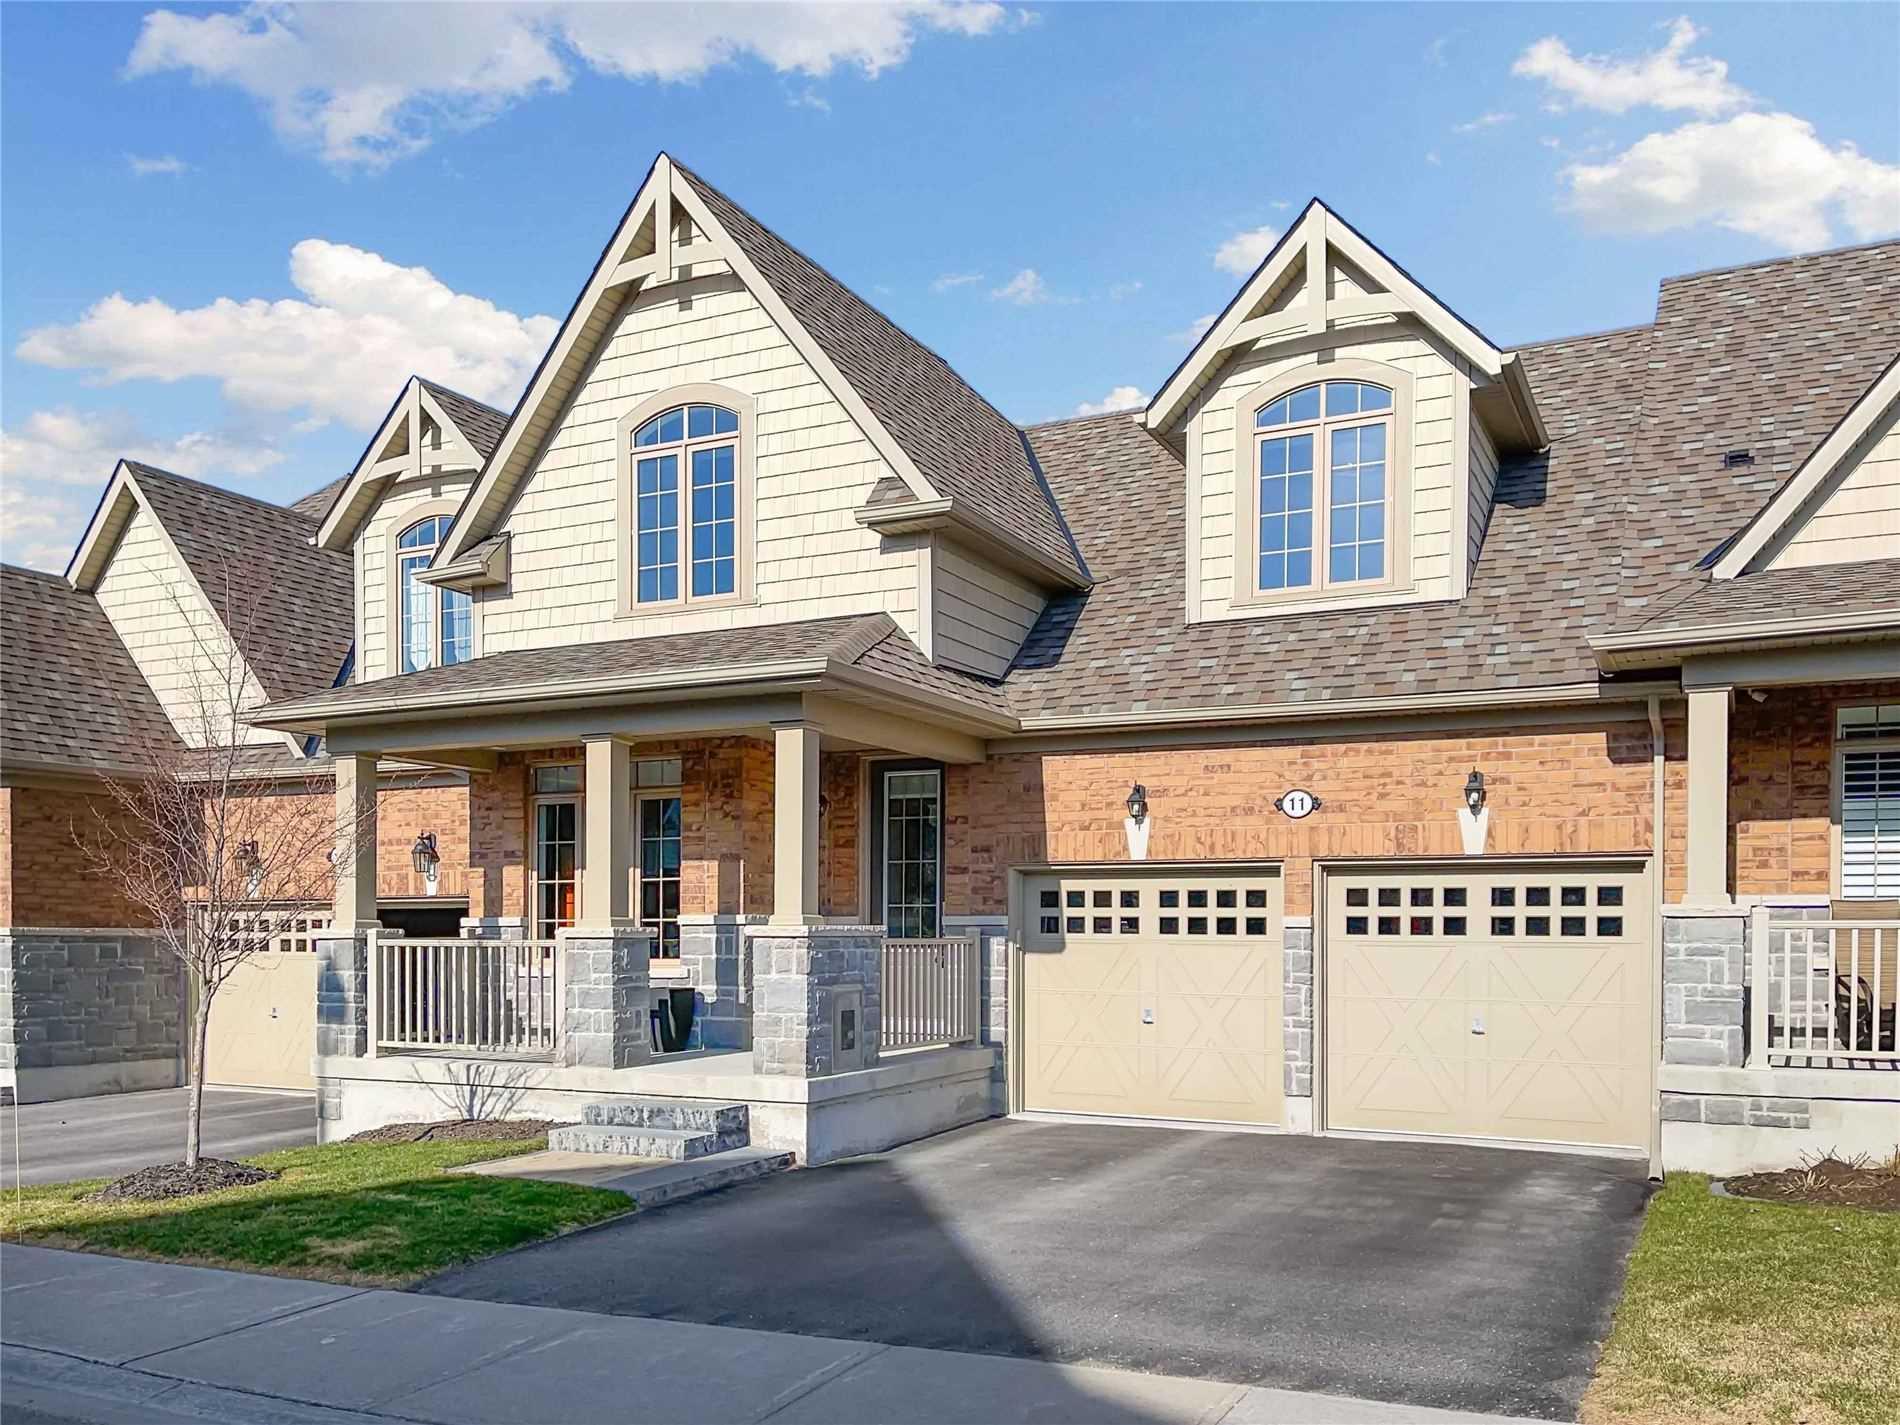 11 Bill Knowles St, Uxbridge, Ontario L9P0E5, 3 Bedrooms Bedrooms, ,3 BathroomsBathrooms,Condo Townhouse,For Sale,Bill Knowles,N5185805